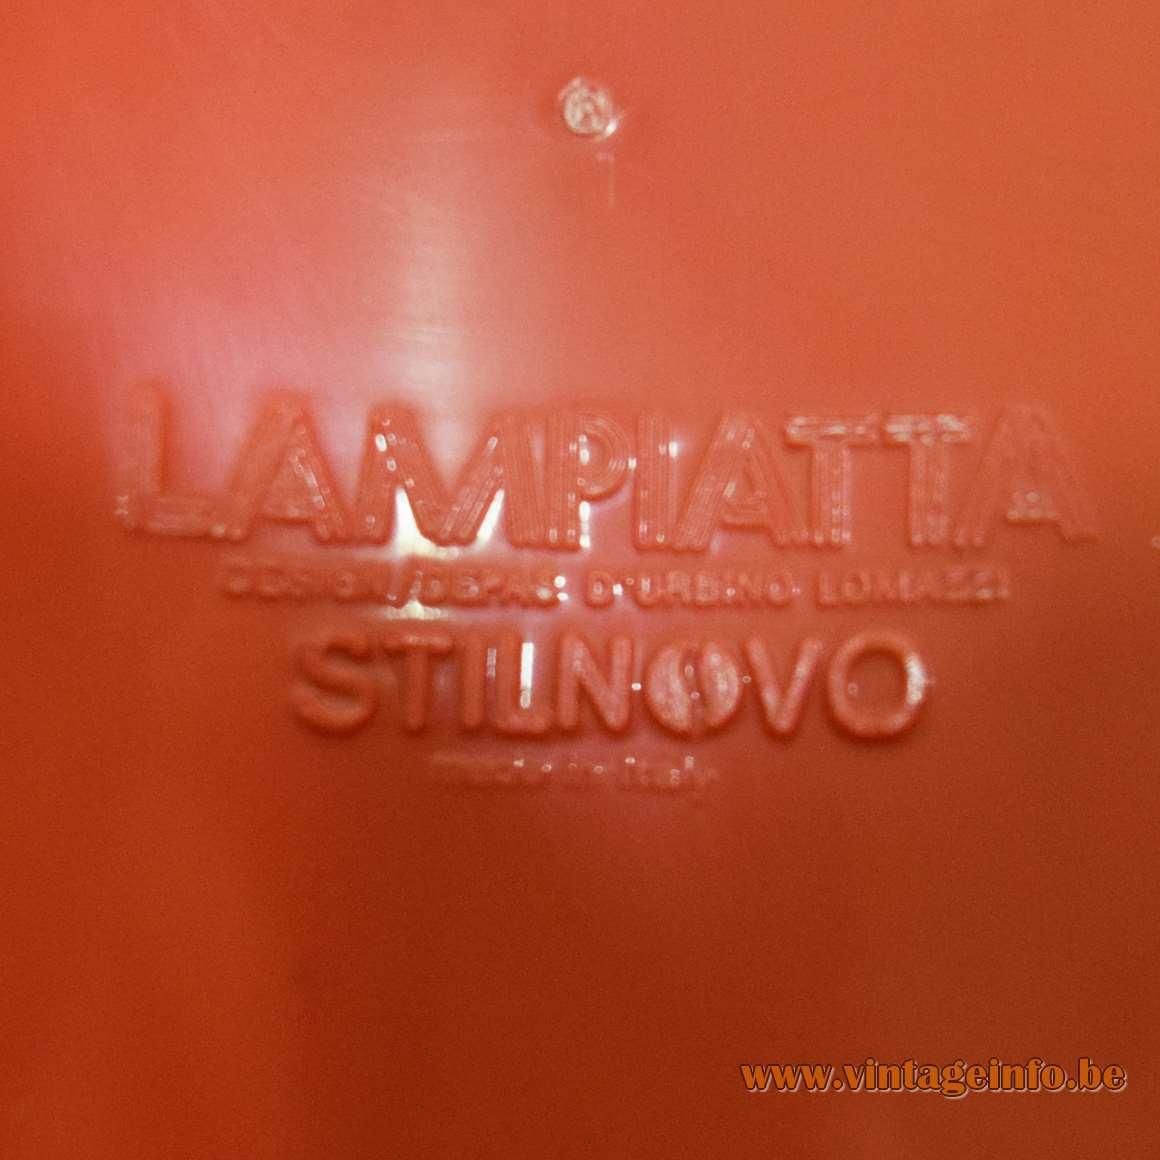 Stilnovo Lampiatta Table Lamp - Molded label on the inside